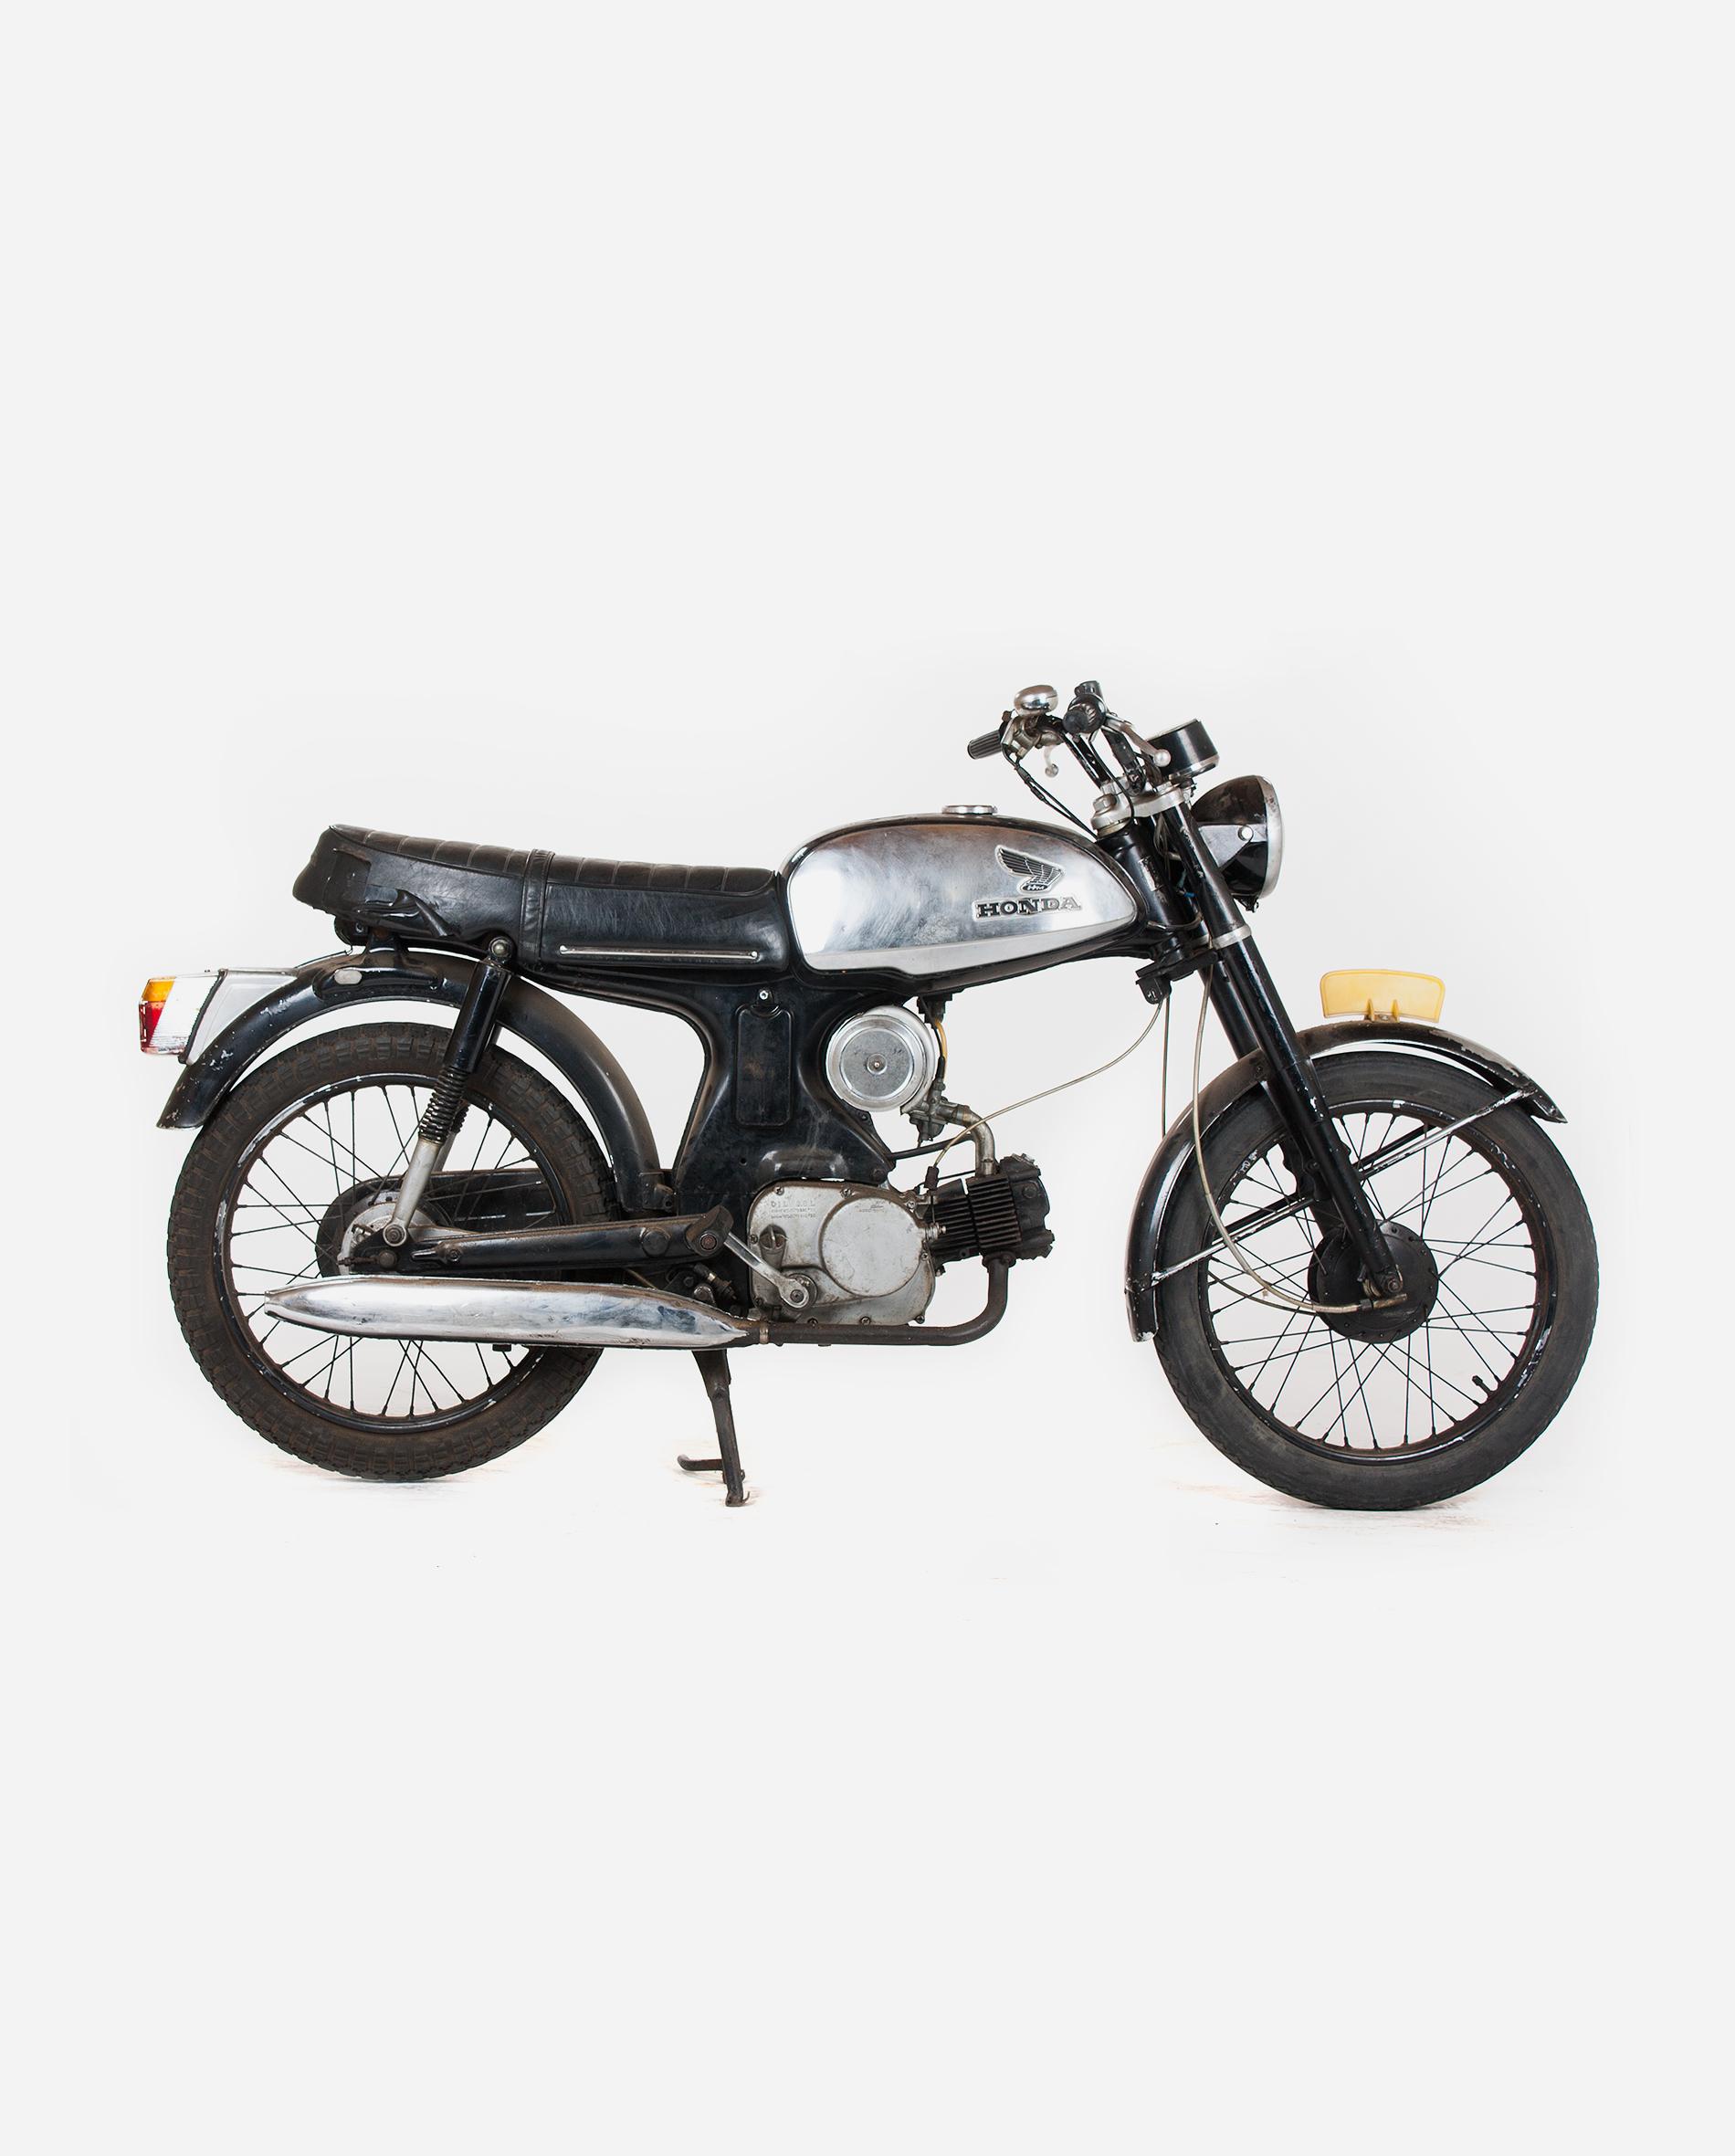 Honda-c320ts50-uitlaat-r · Fourstrokebarn